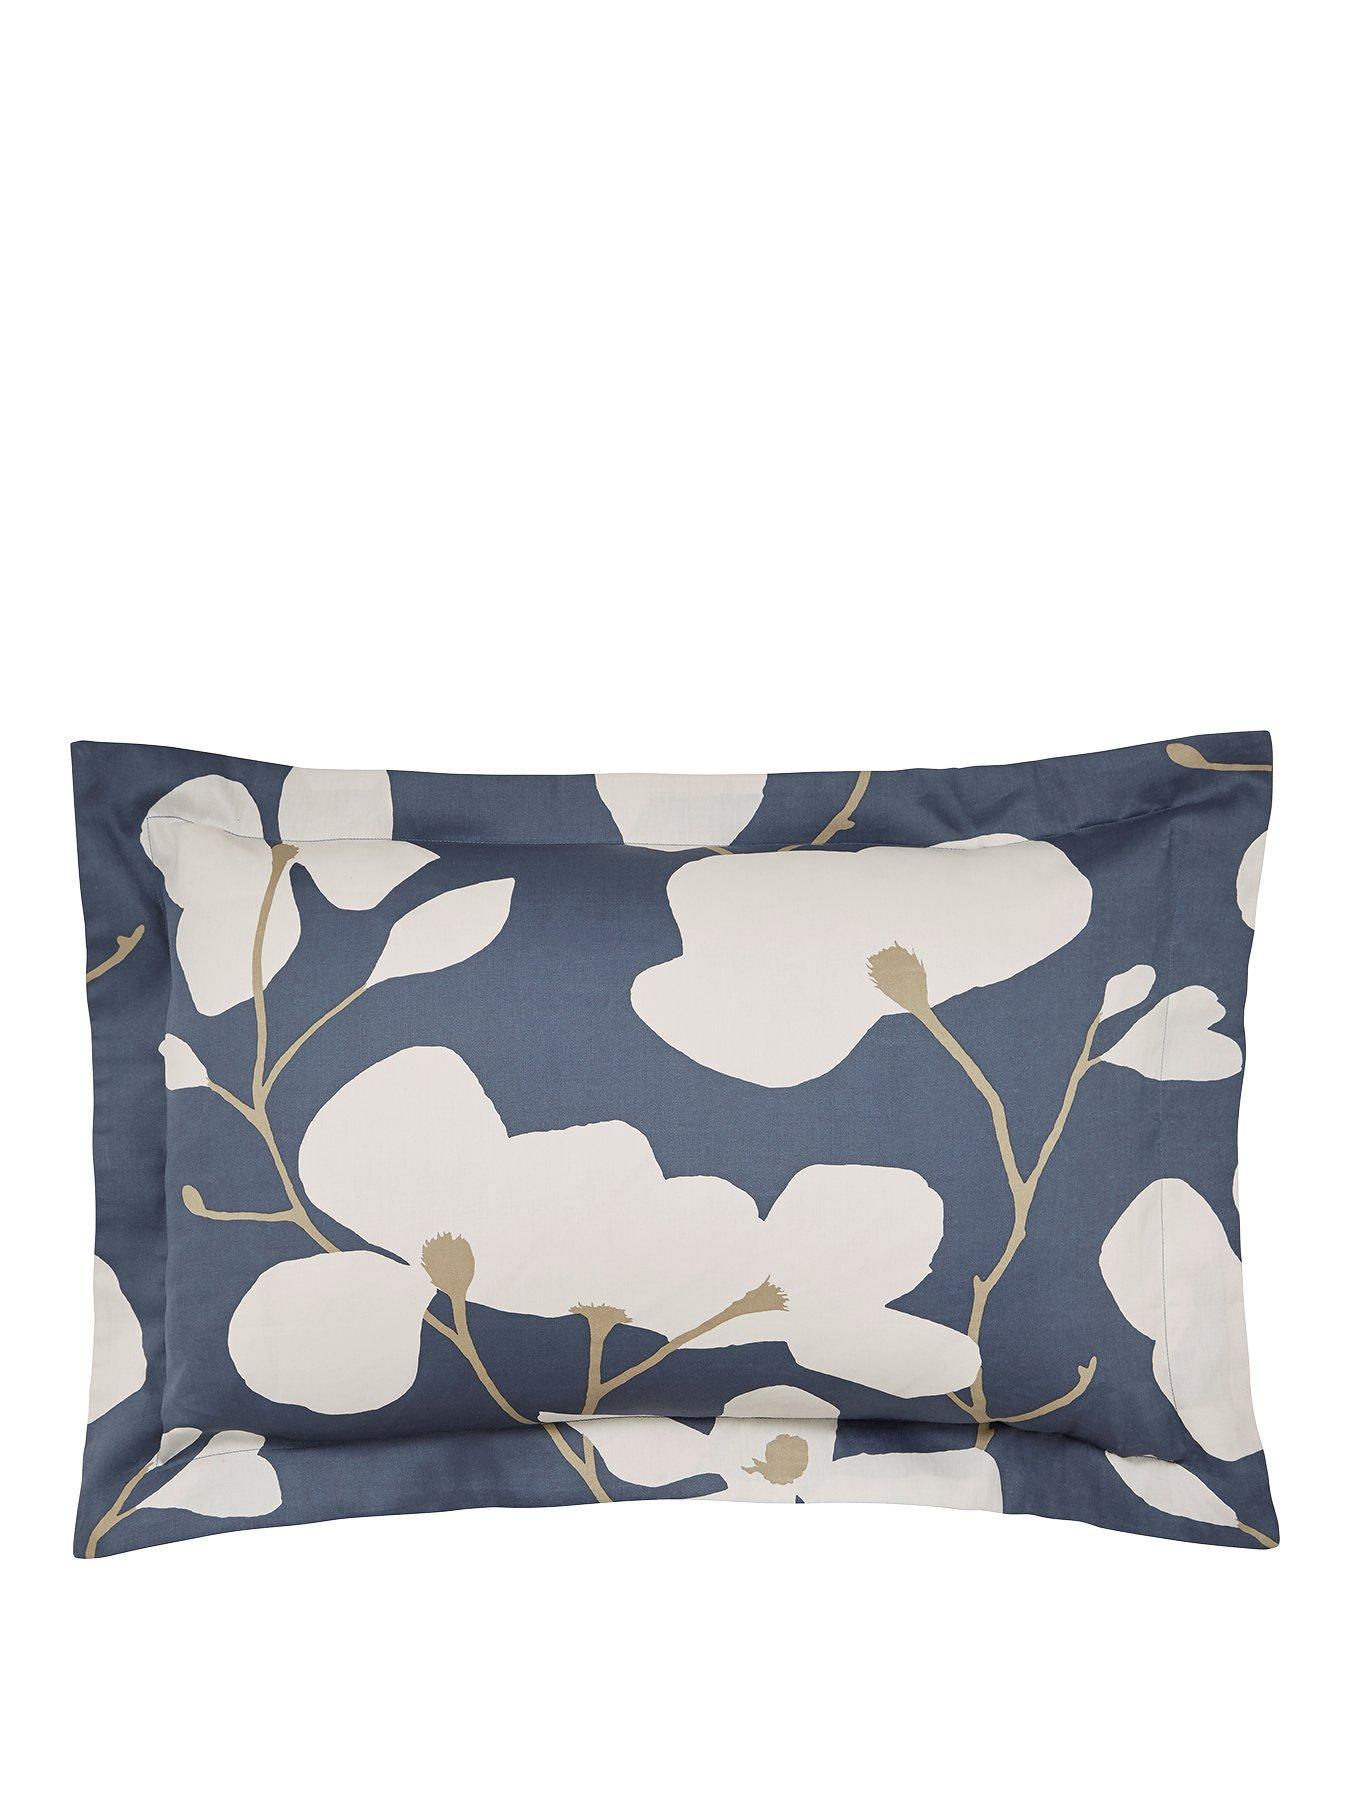 Harlequin Kienze Oxford Pillowcase